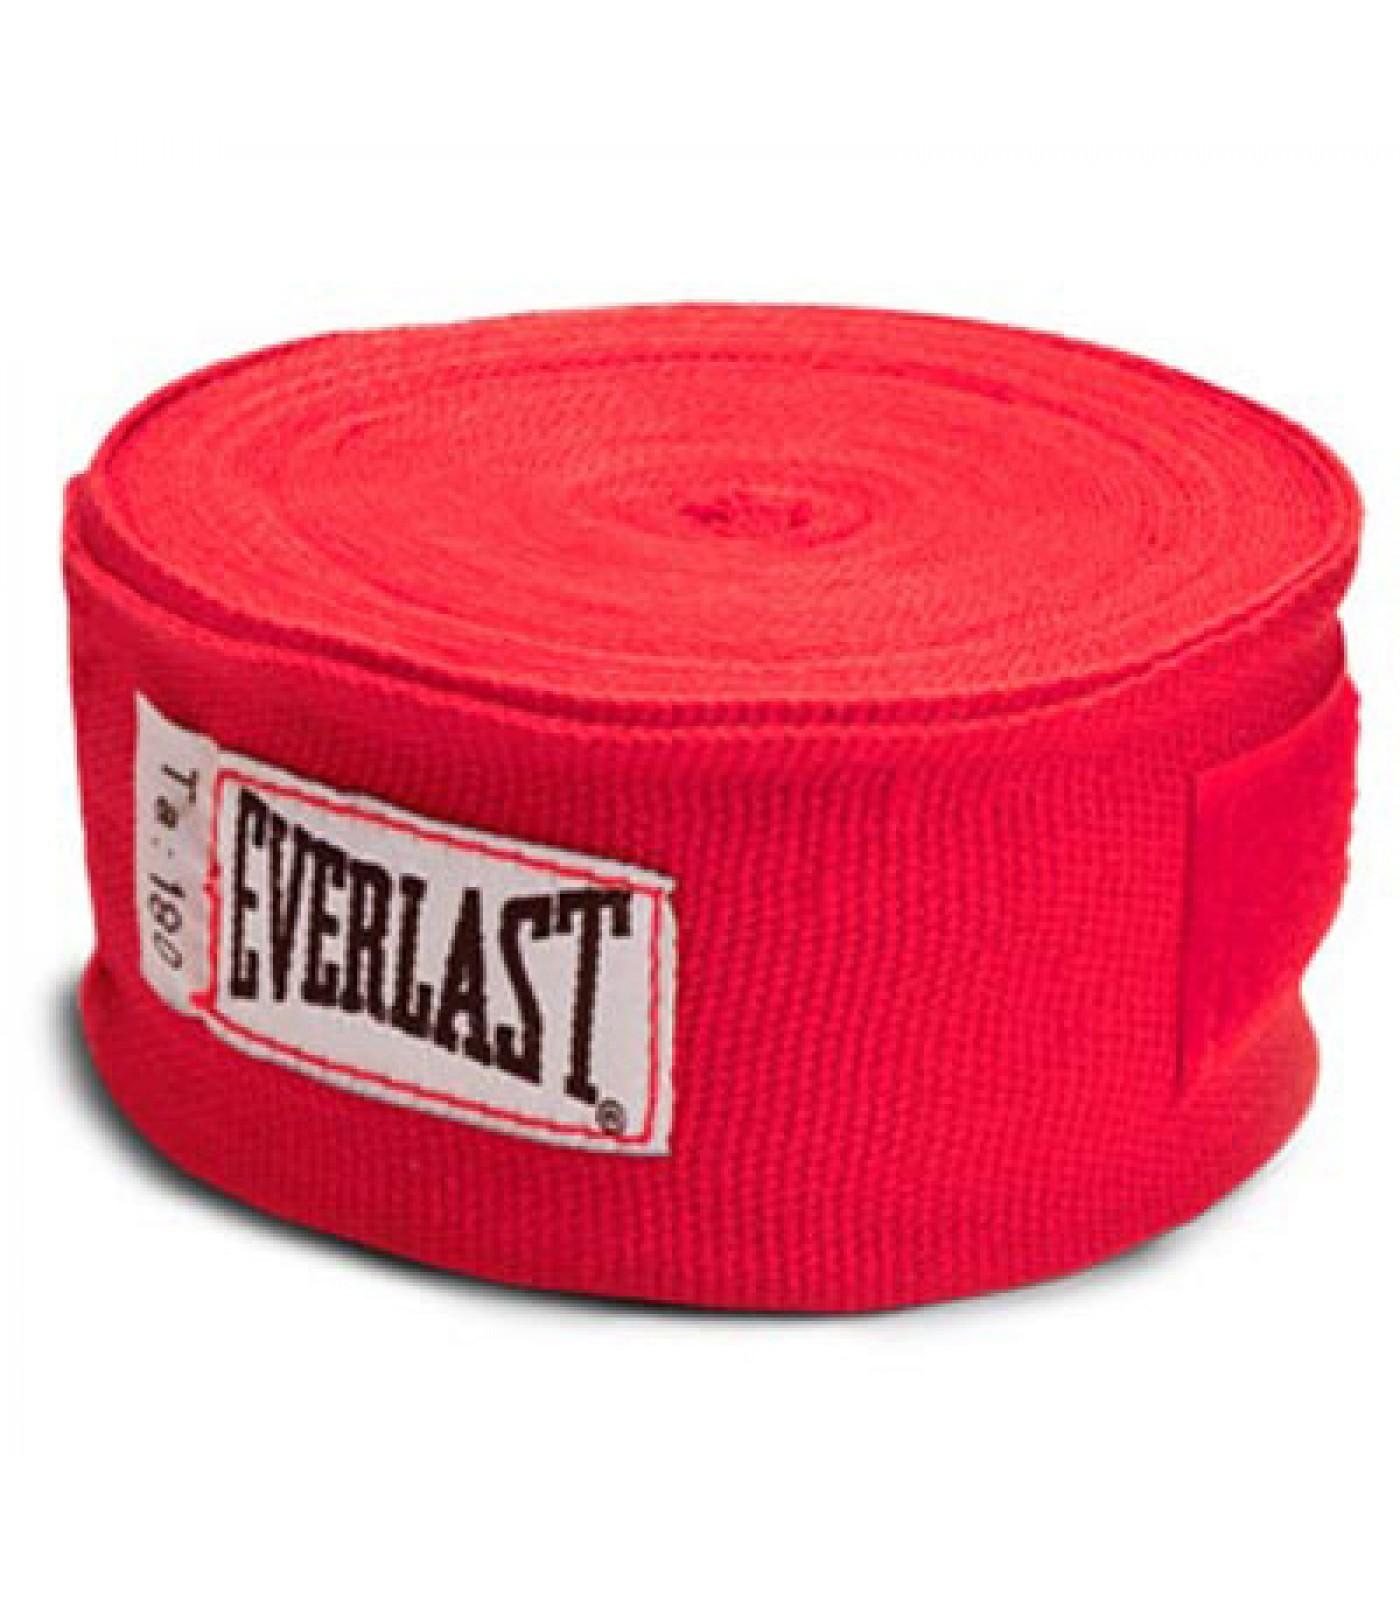 Everlast - Бинт червен - 3.05 метра (RED)